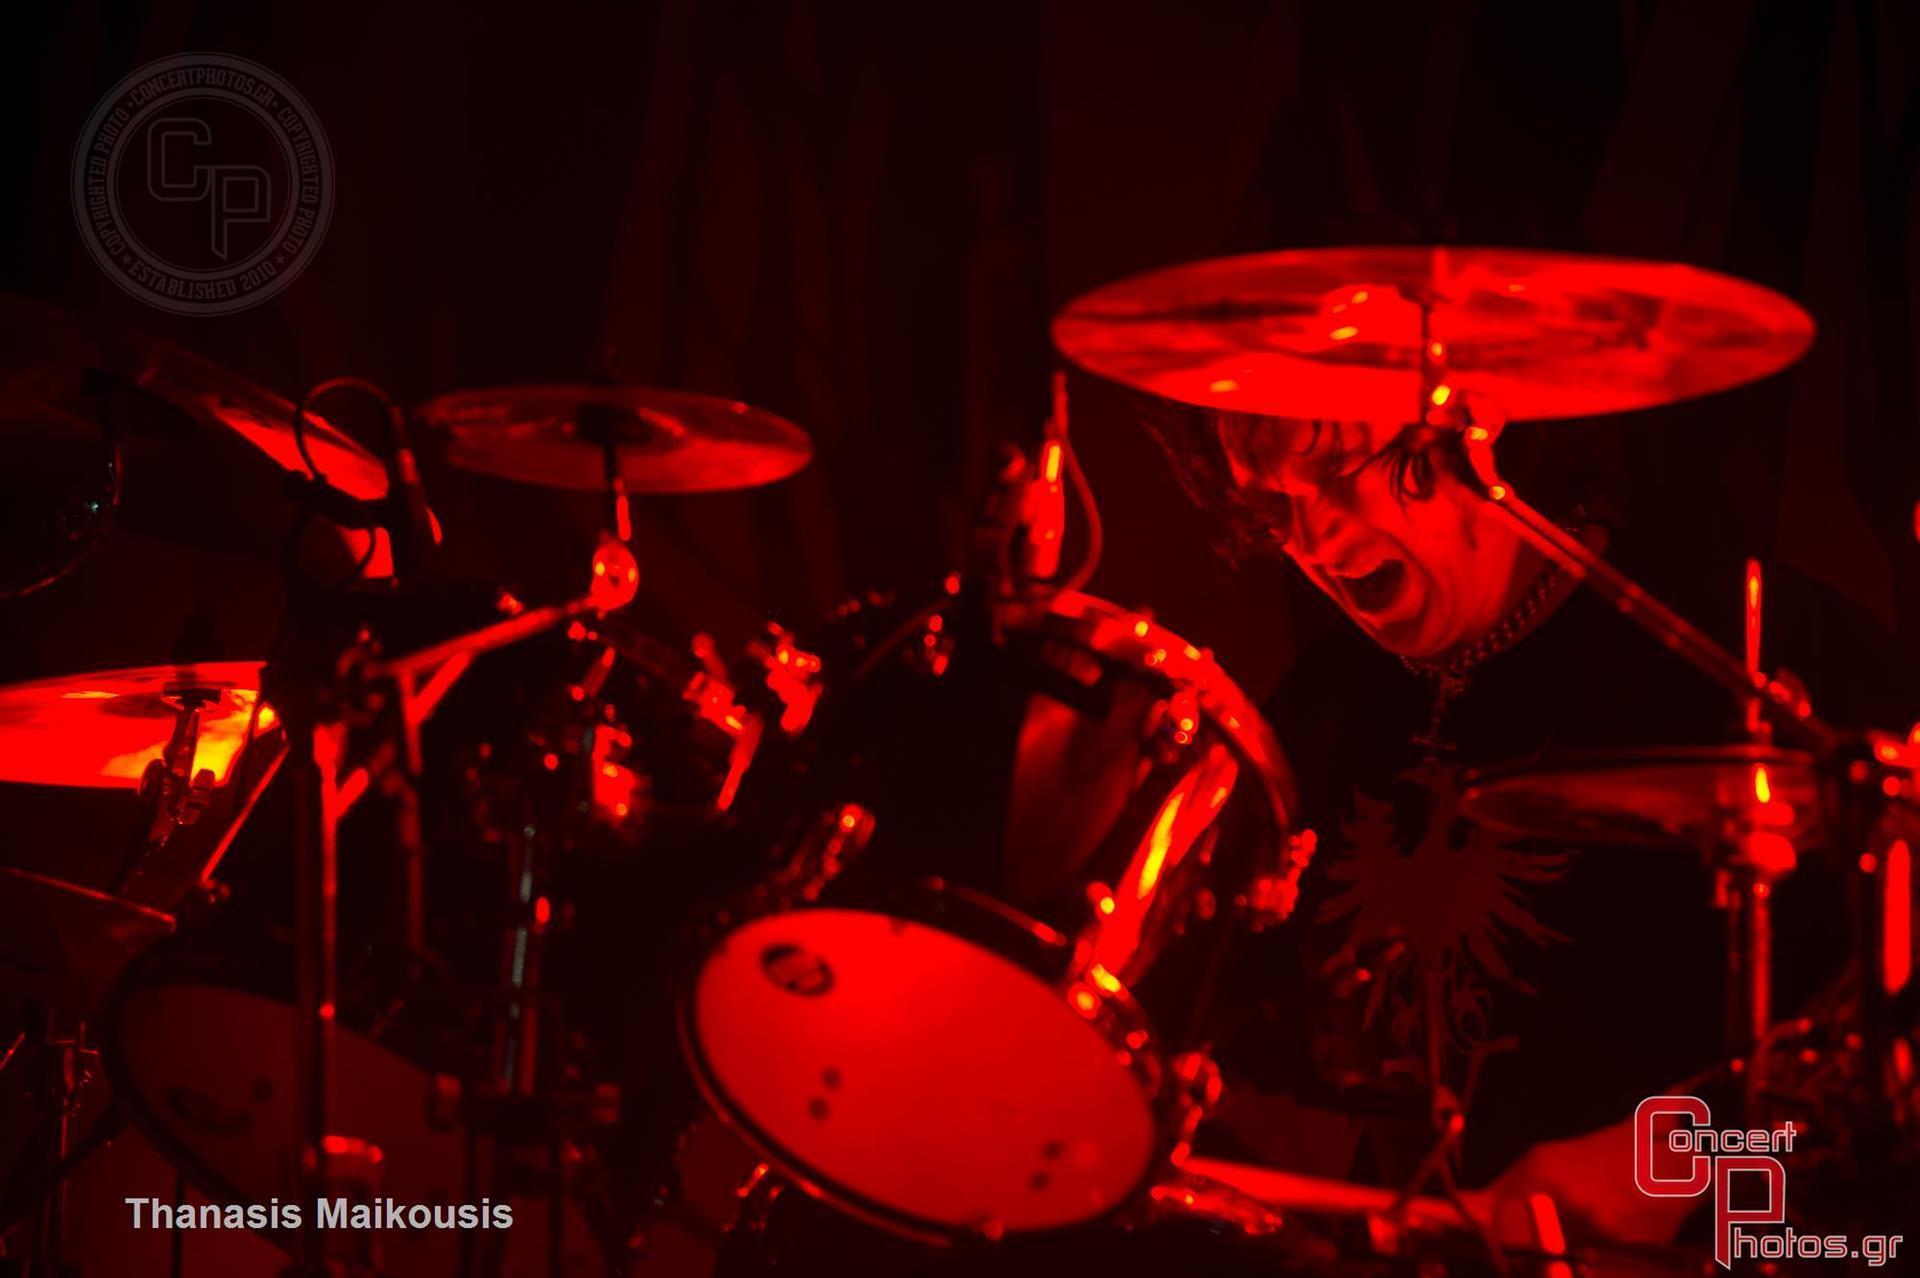 At The Gates-At The Gates Fuzz photographer: Thanasis Maikousis - ConcertPhotos - 20150109_2334_30